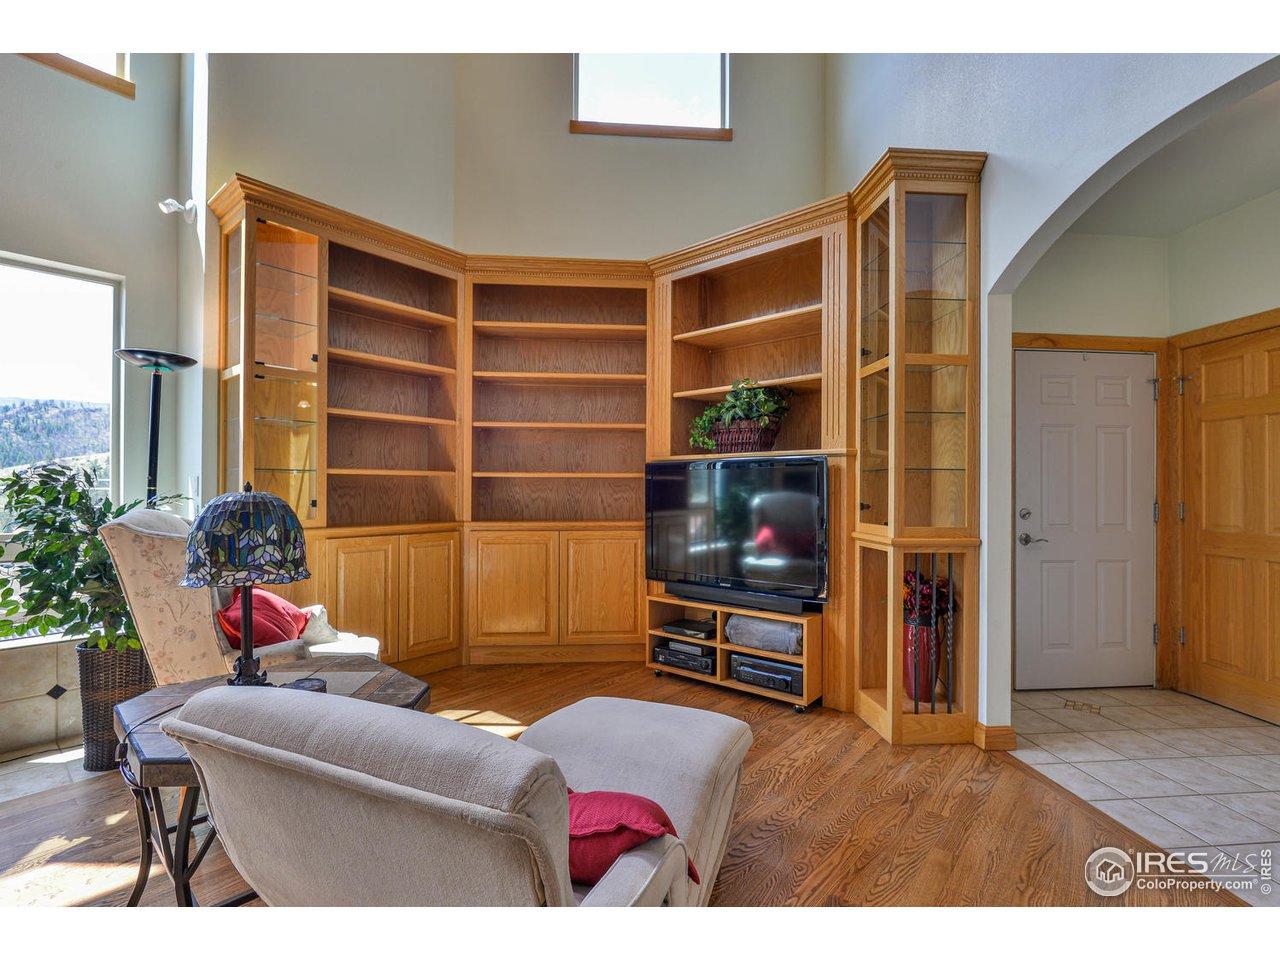 Built In Bookshelf & Display Cases